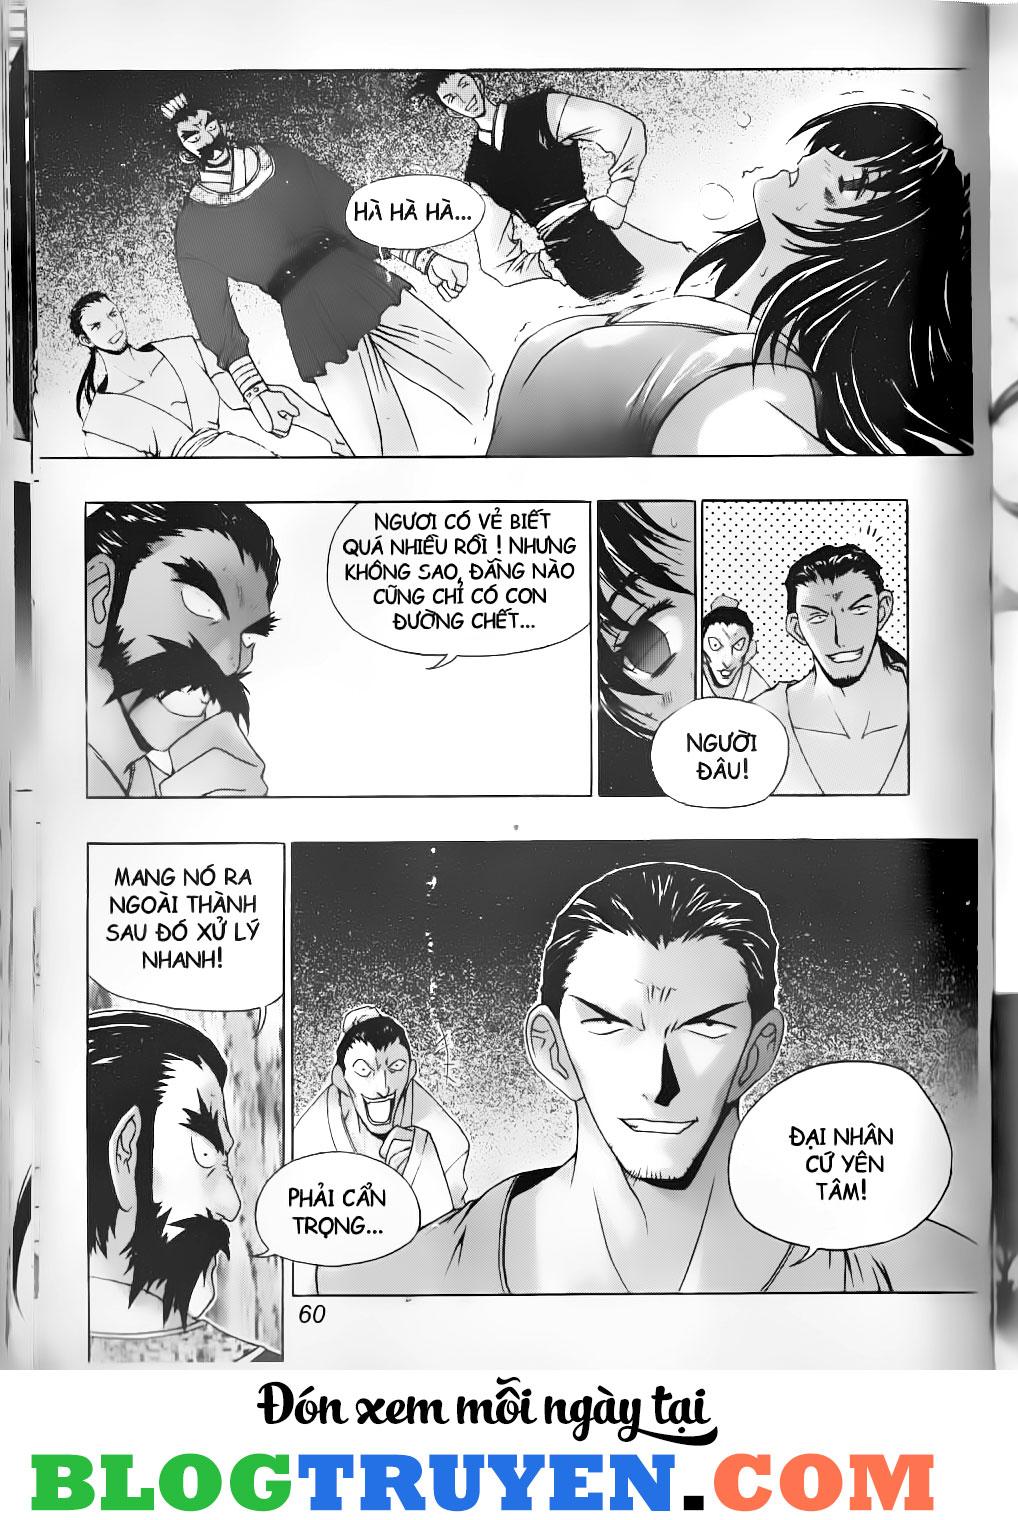 Thiên Lang Liệt Truyện Scan Chap 17 - Truyen.Chap.VN